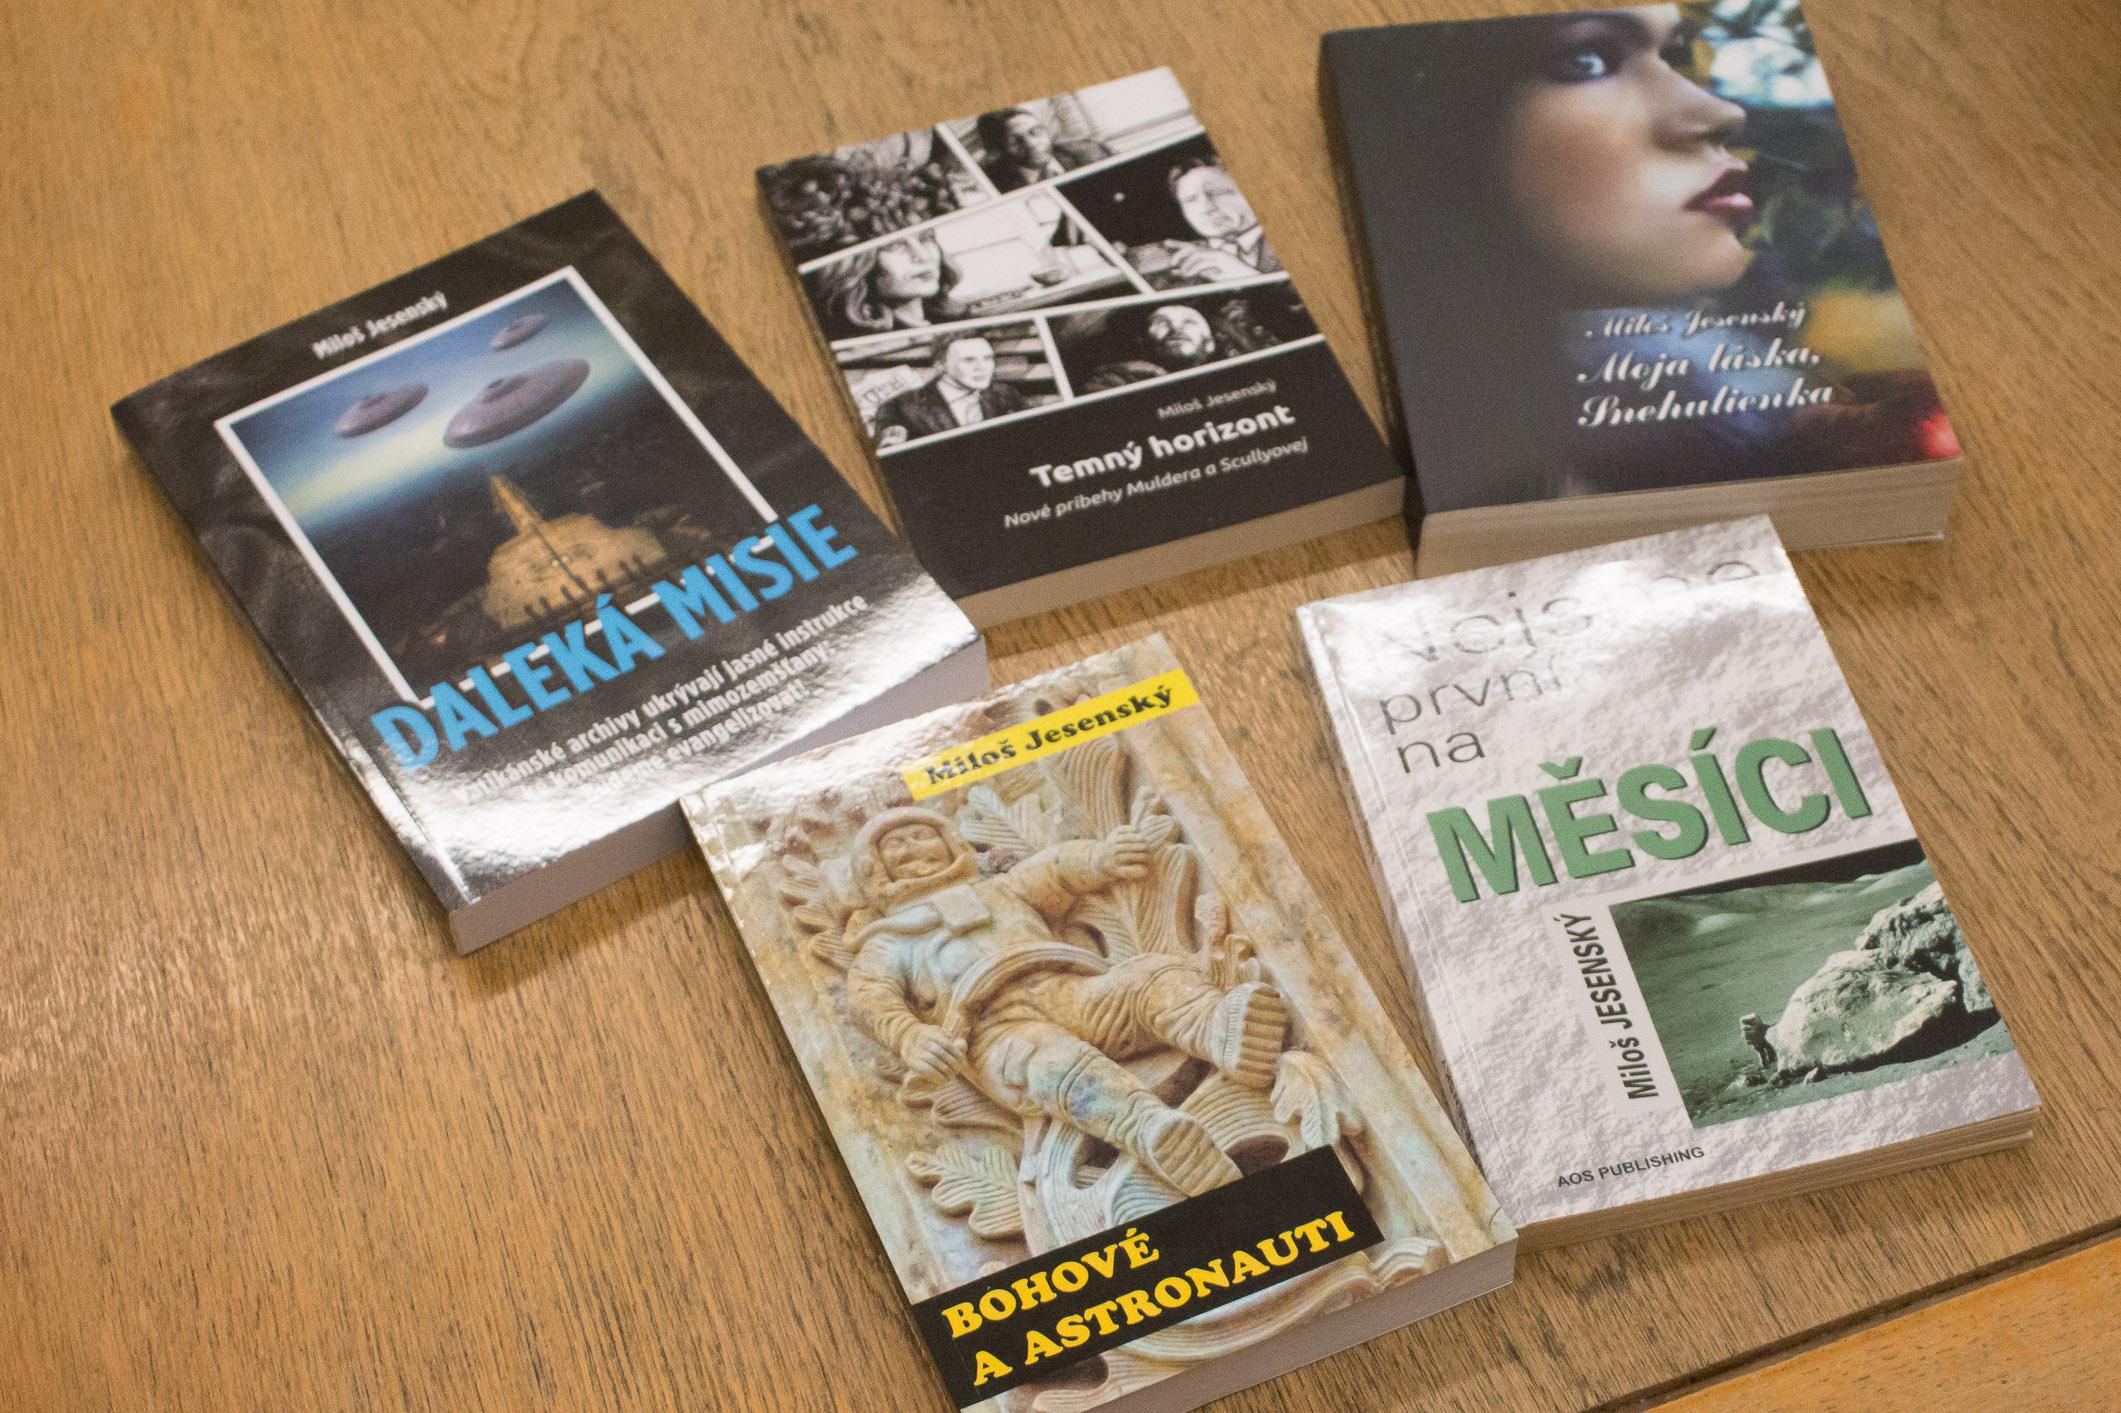 milos-jesensky-knihy-2